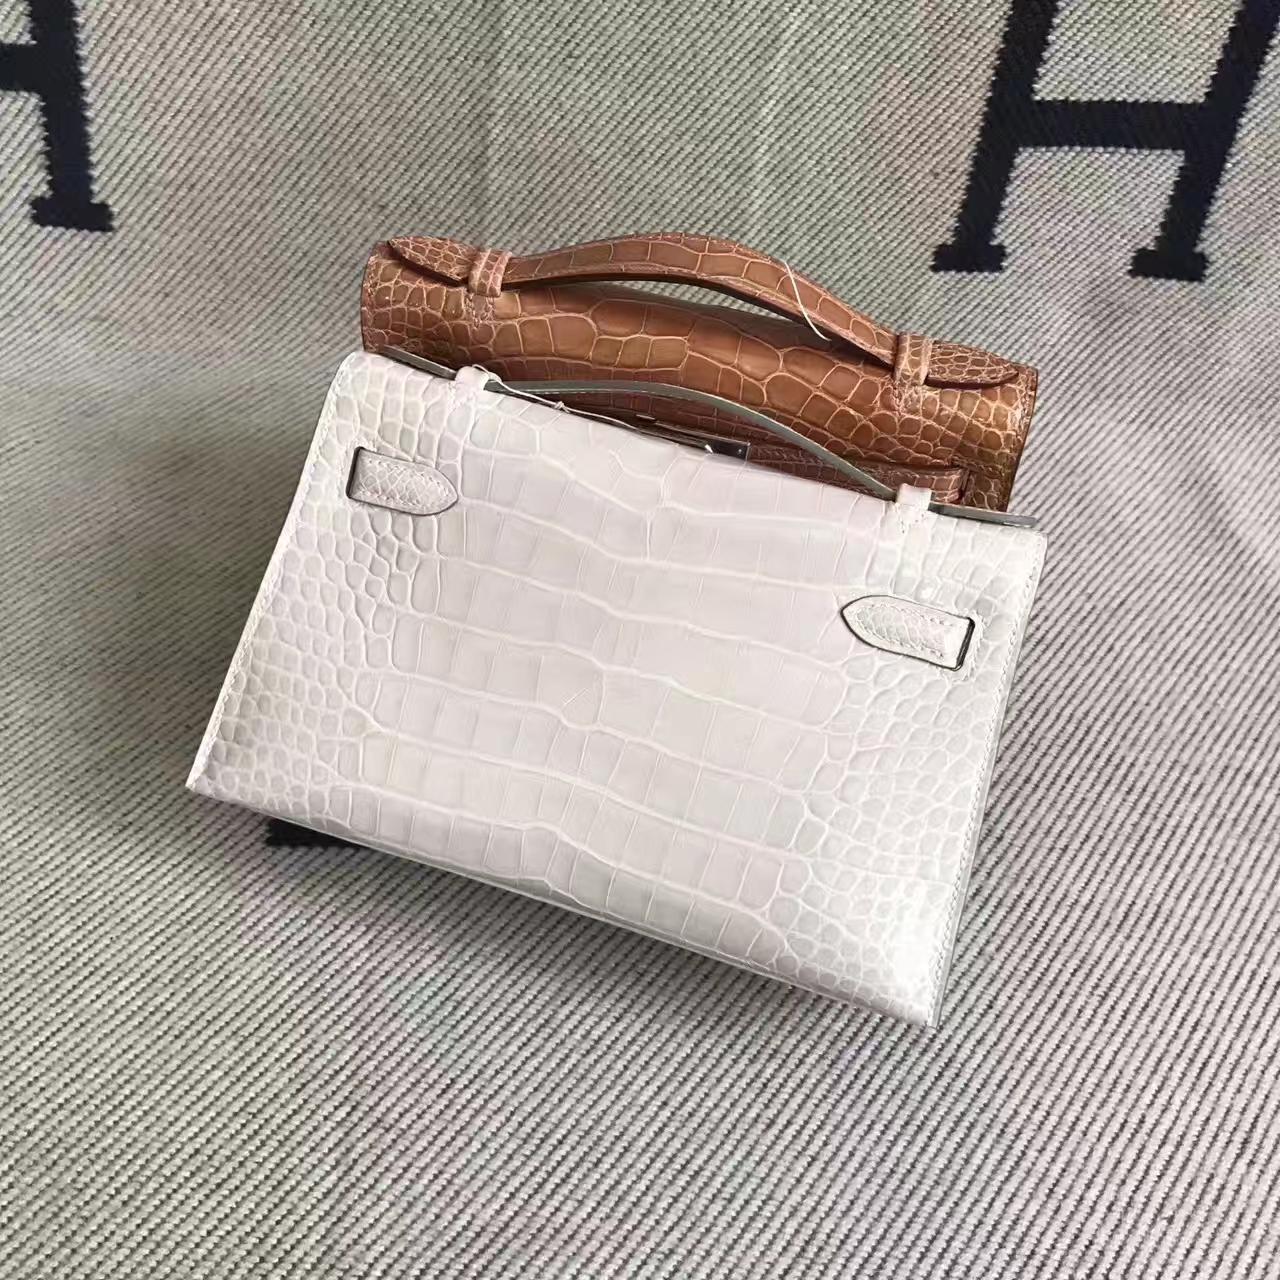 Discount Hermes 8L Beton Matt AlligatorCrocodile Minikelly Clutch Bag22CM